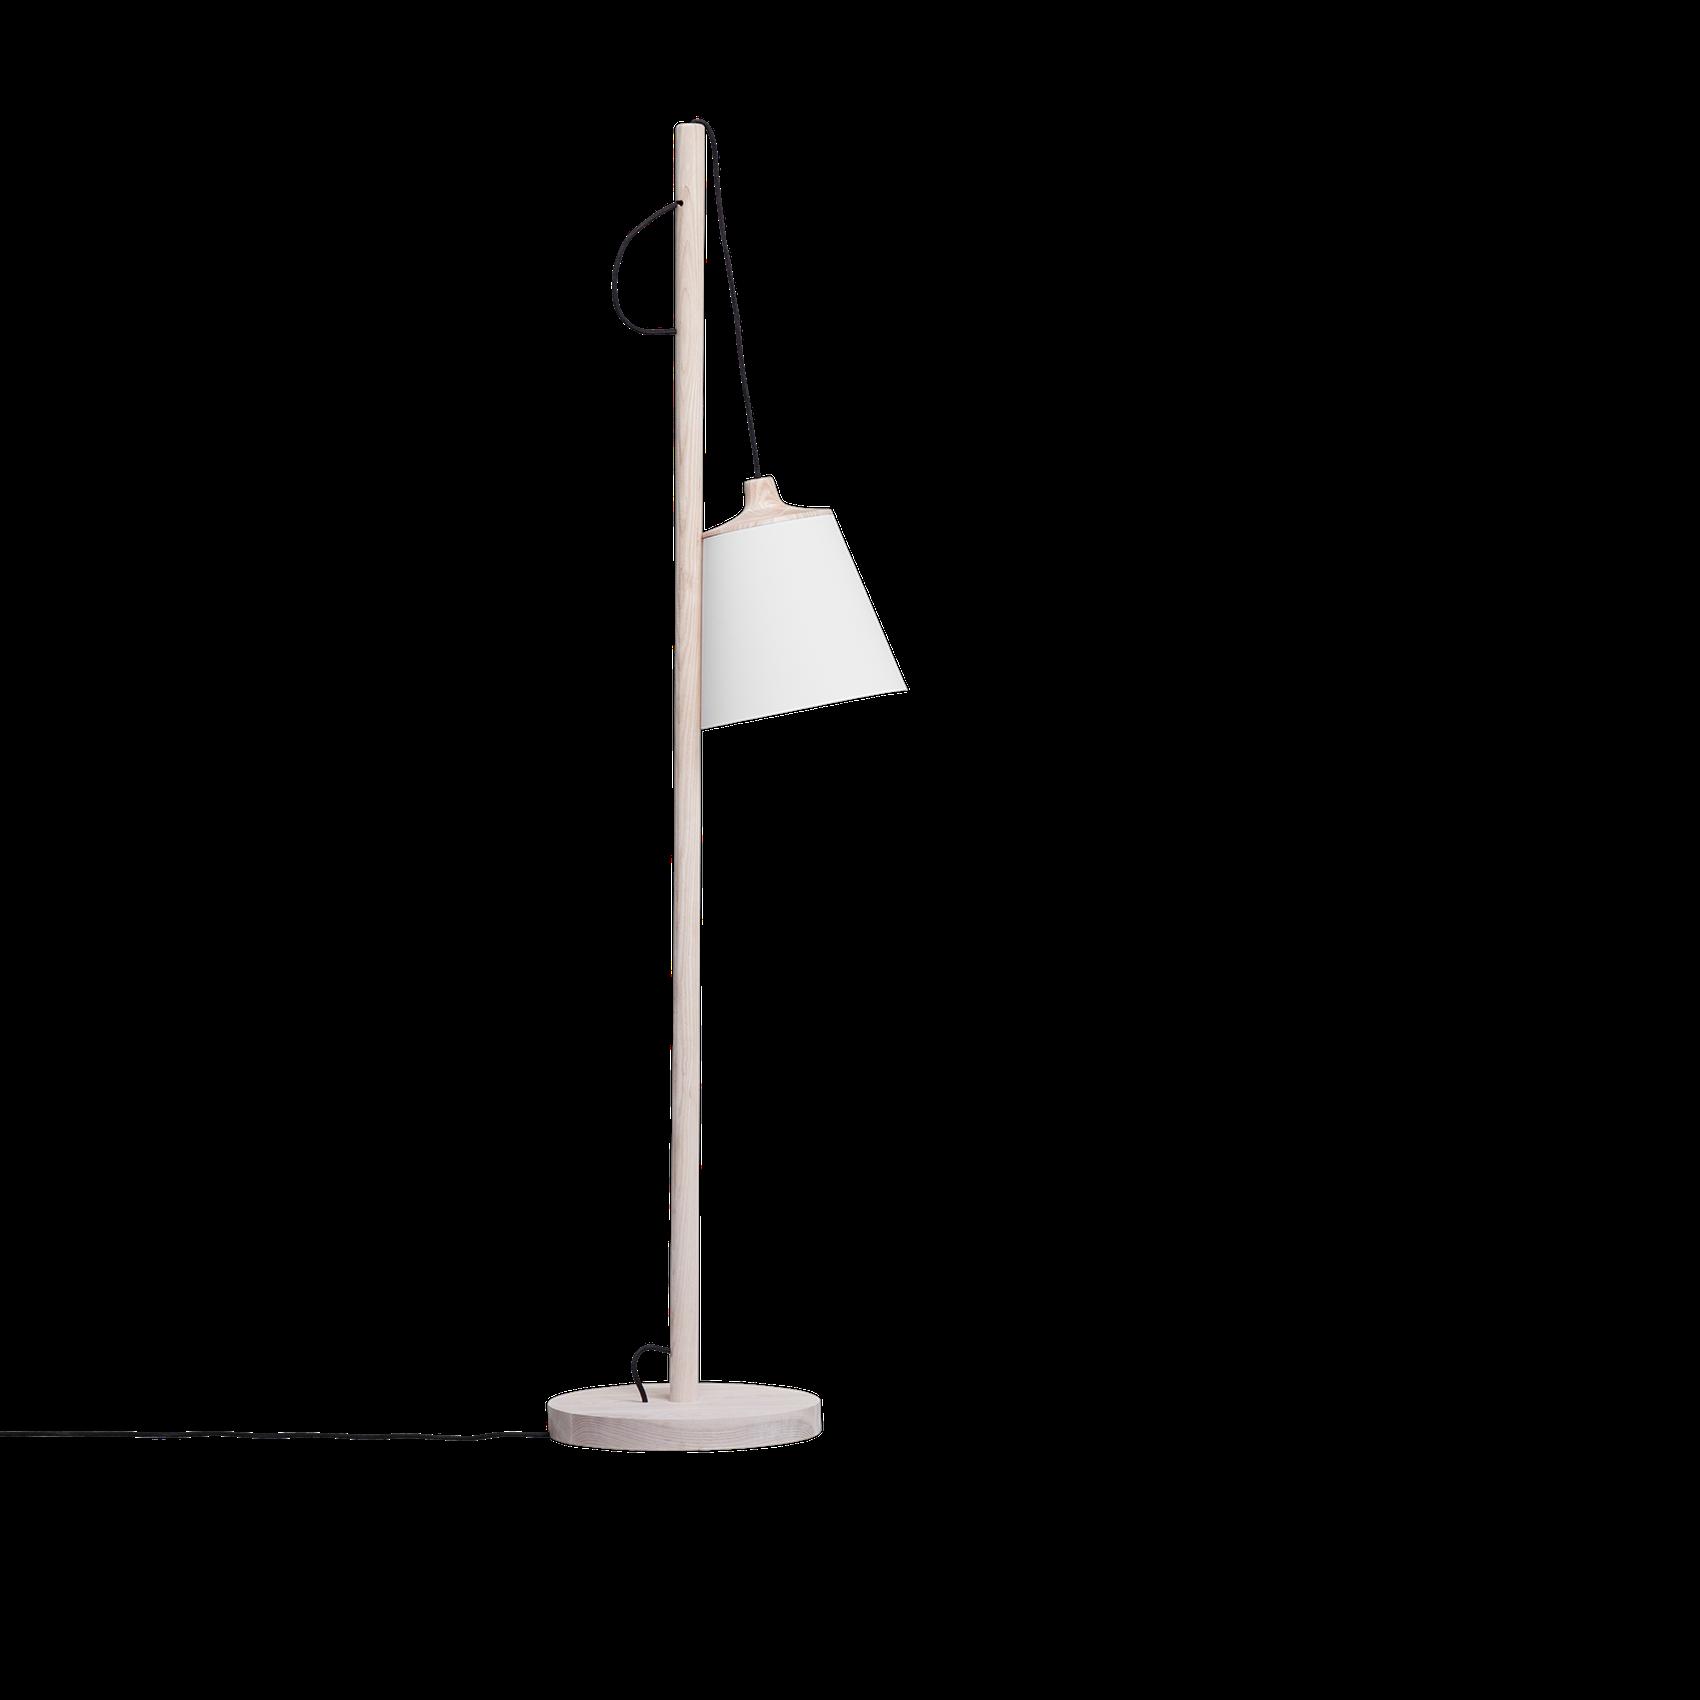 Pull Lamp A Playfully Scandinavian Floor Lamp Floor Lamp Design Floor Lamp Lamp